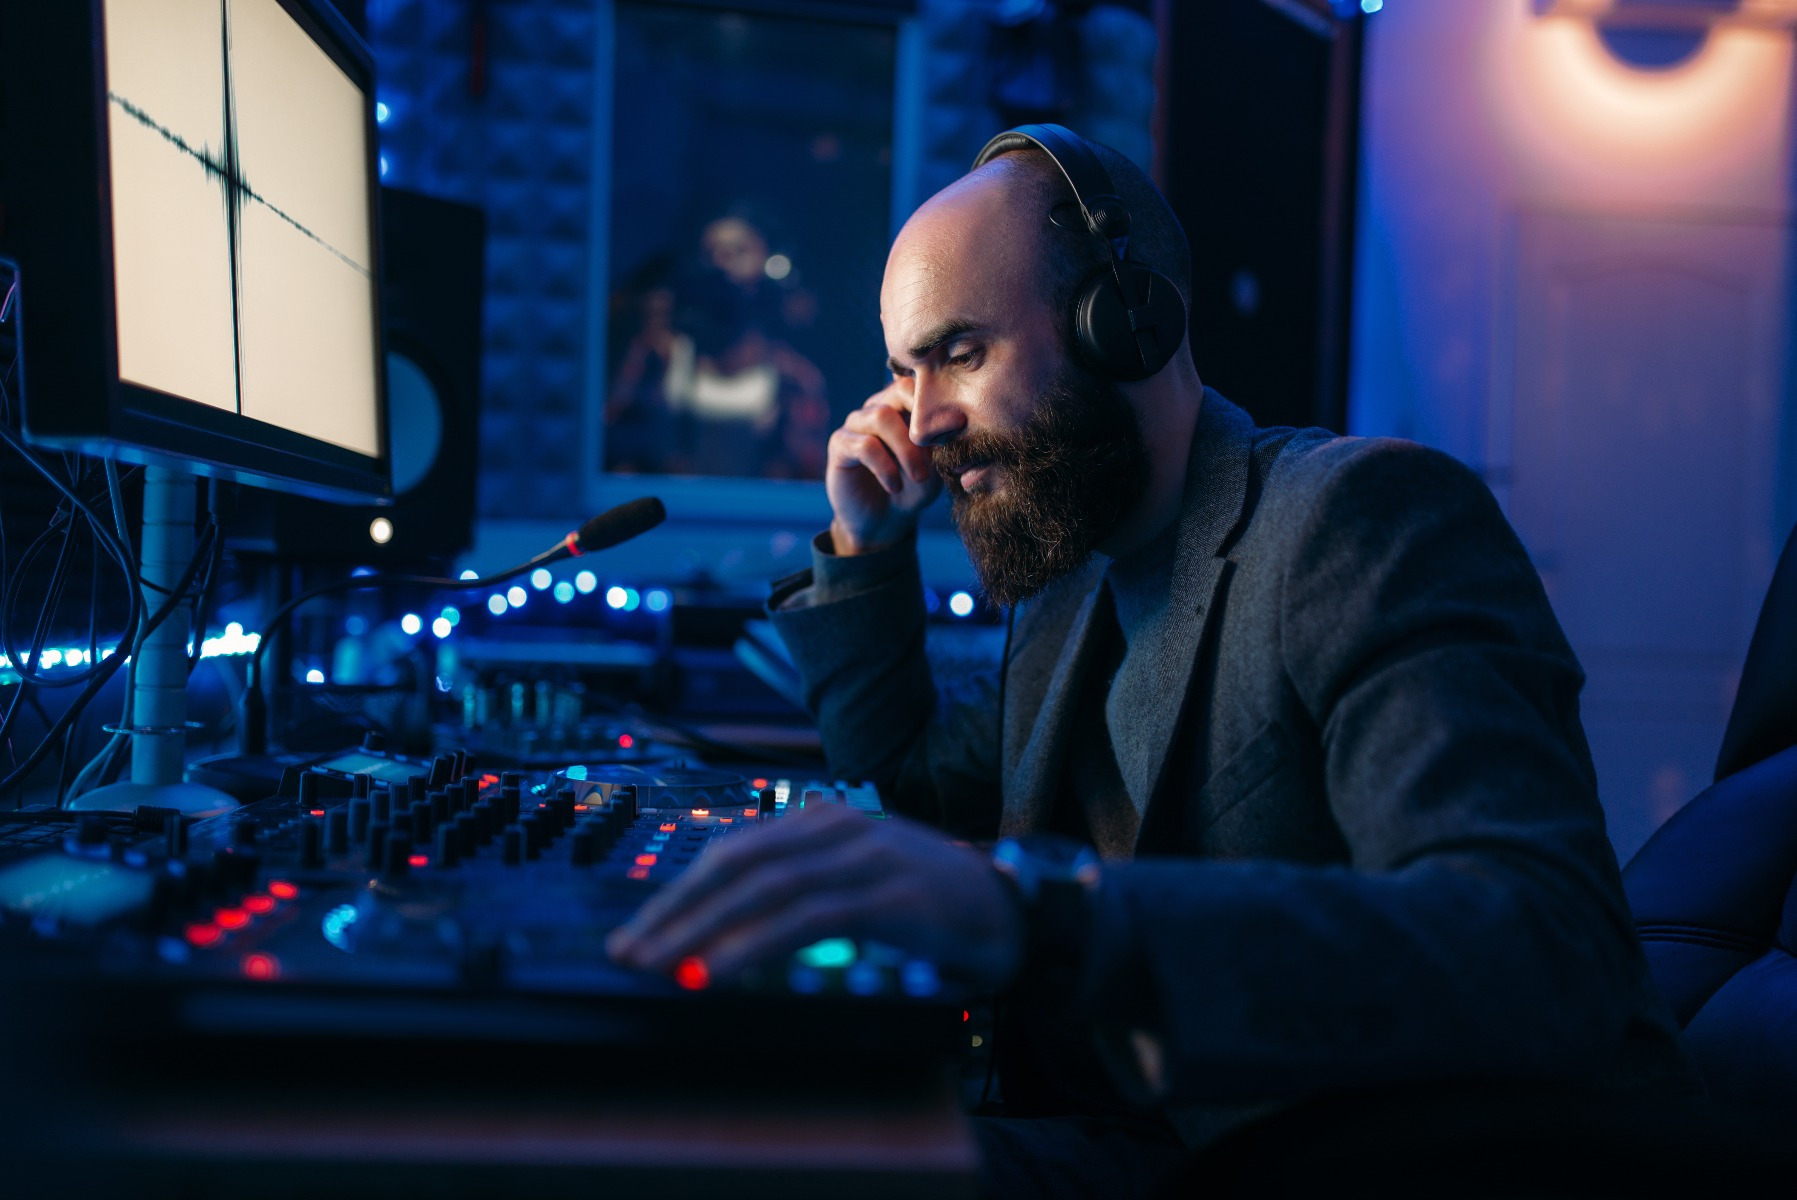 Sound engineer recording mixing desk